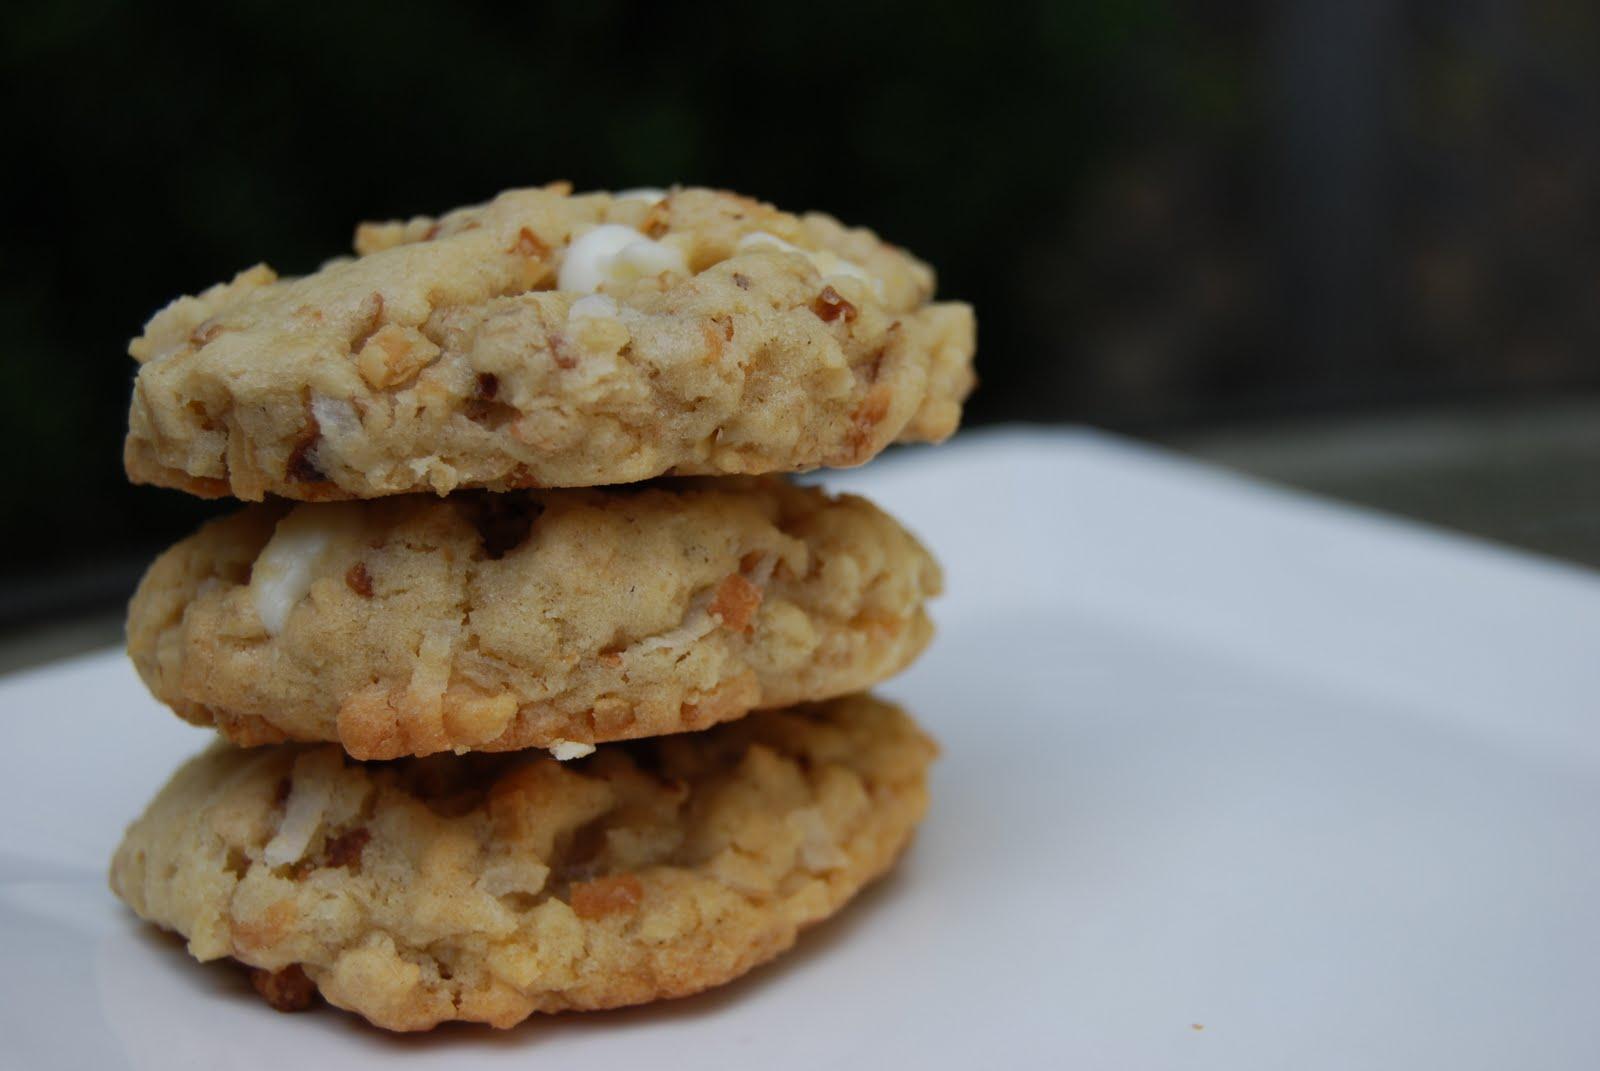 Oatmeal White Chocolate Lime Coconut Cookies - Macaroni and Cheesecake